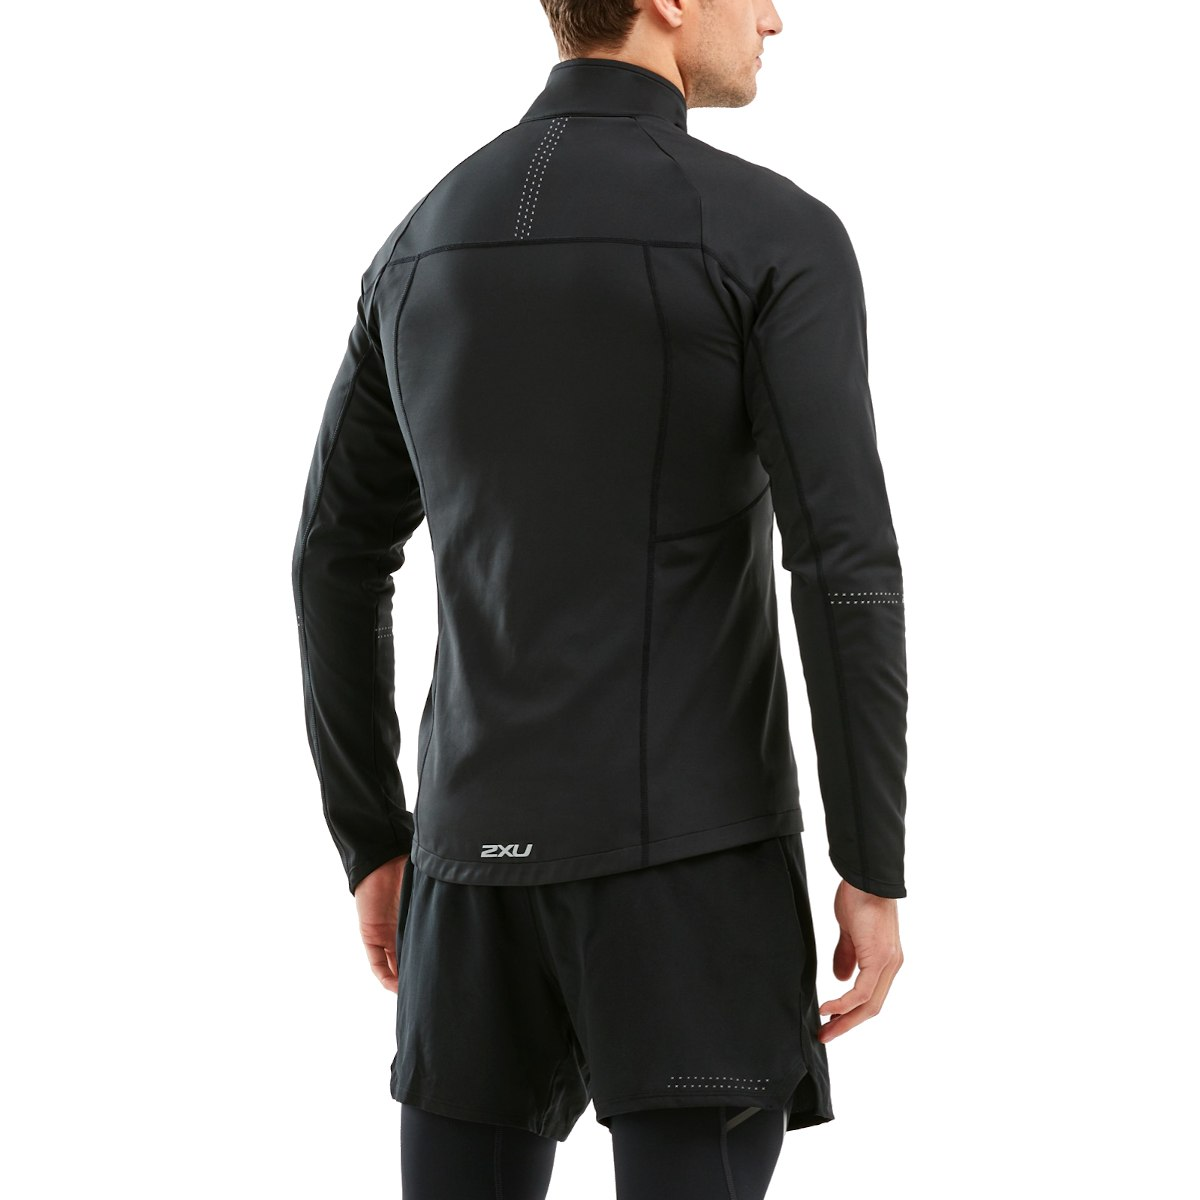 Imagen de 2XU Pursuit Thermal Hybrid Jacket - black/black